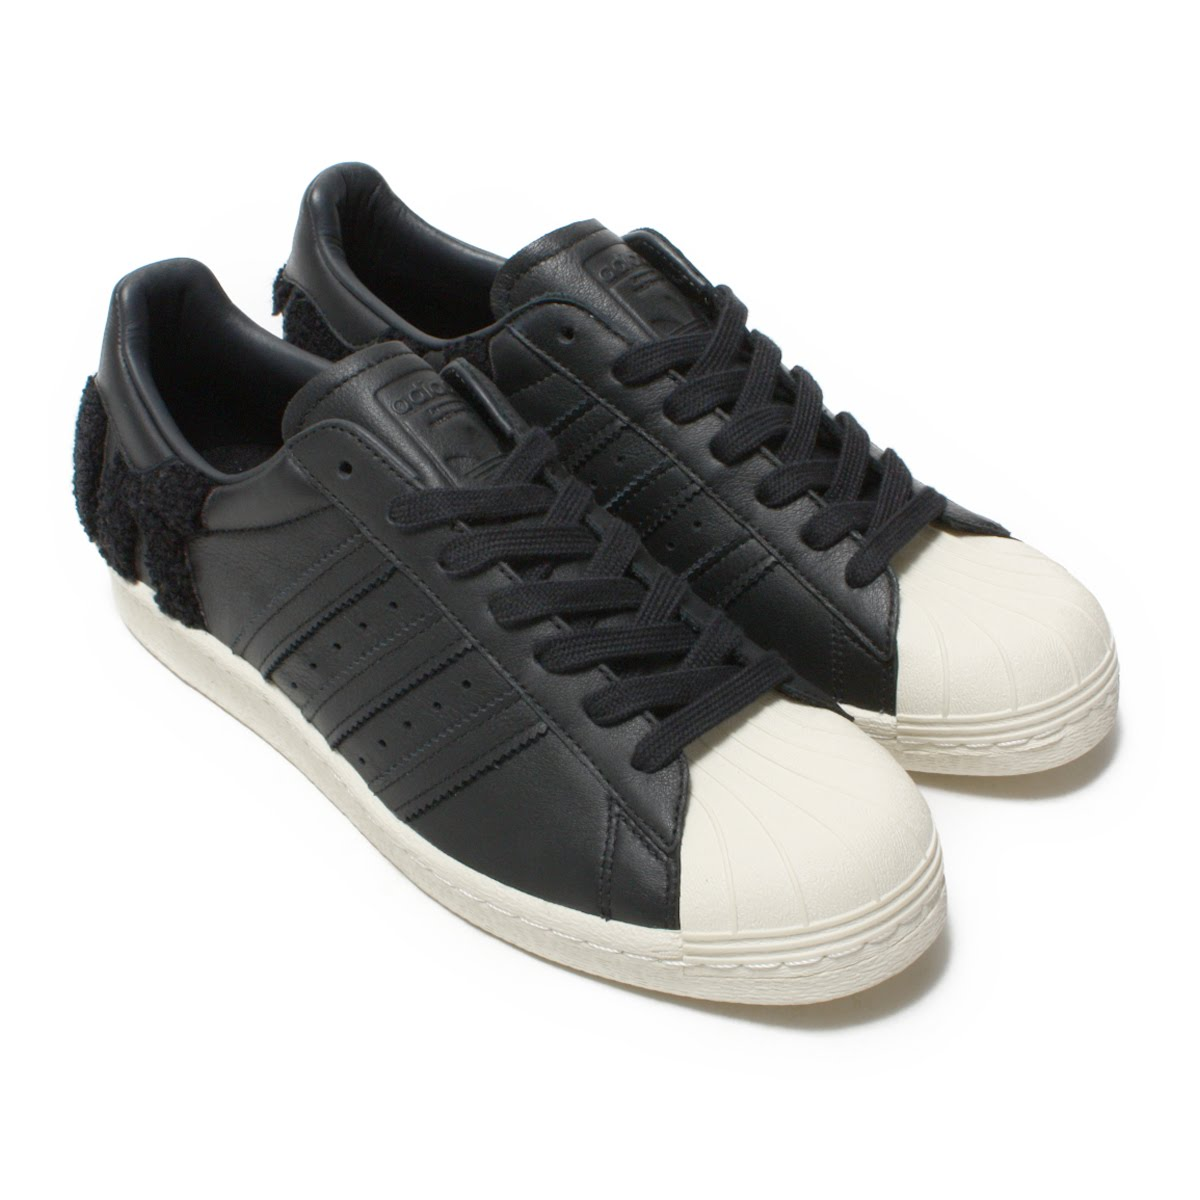 adidas Originals SUPERSTAR 80s(アディダス オリジナルス スーパースター80s)Core Black/Core Black/Off White【メンズ レディース スニーカー】18FW-I